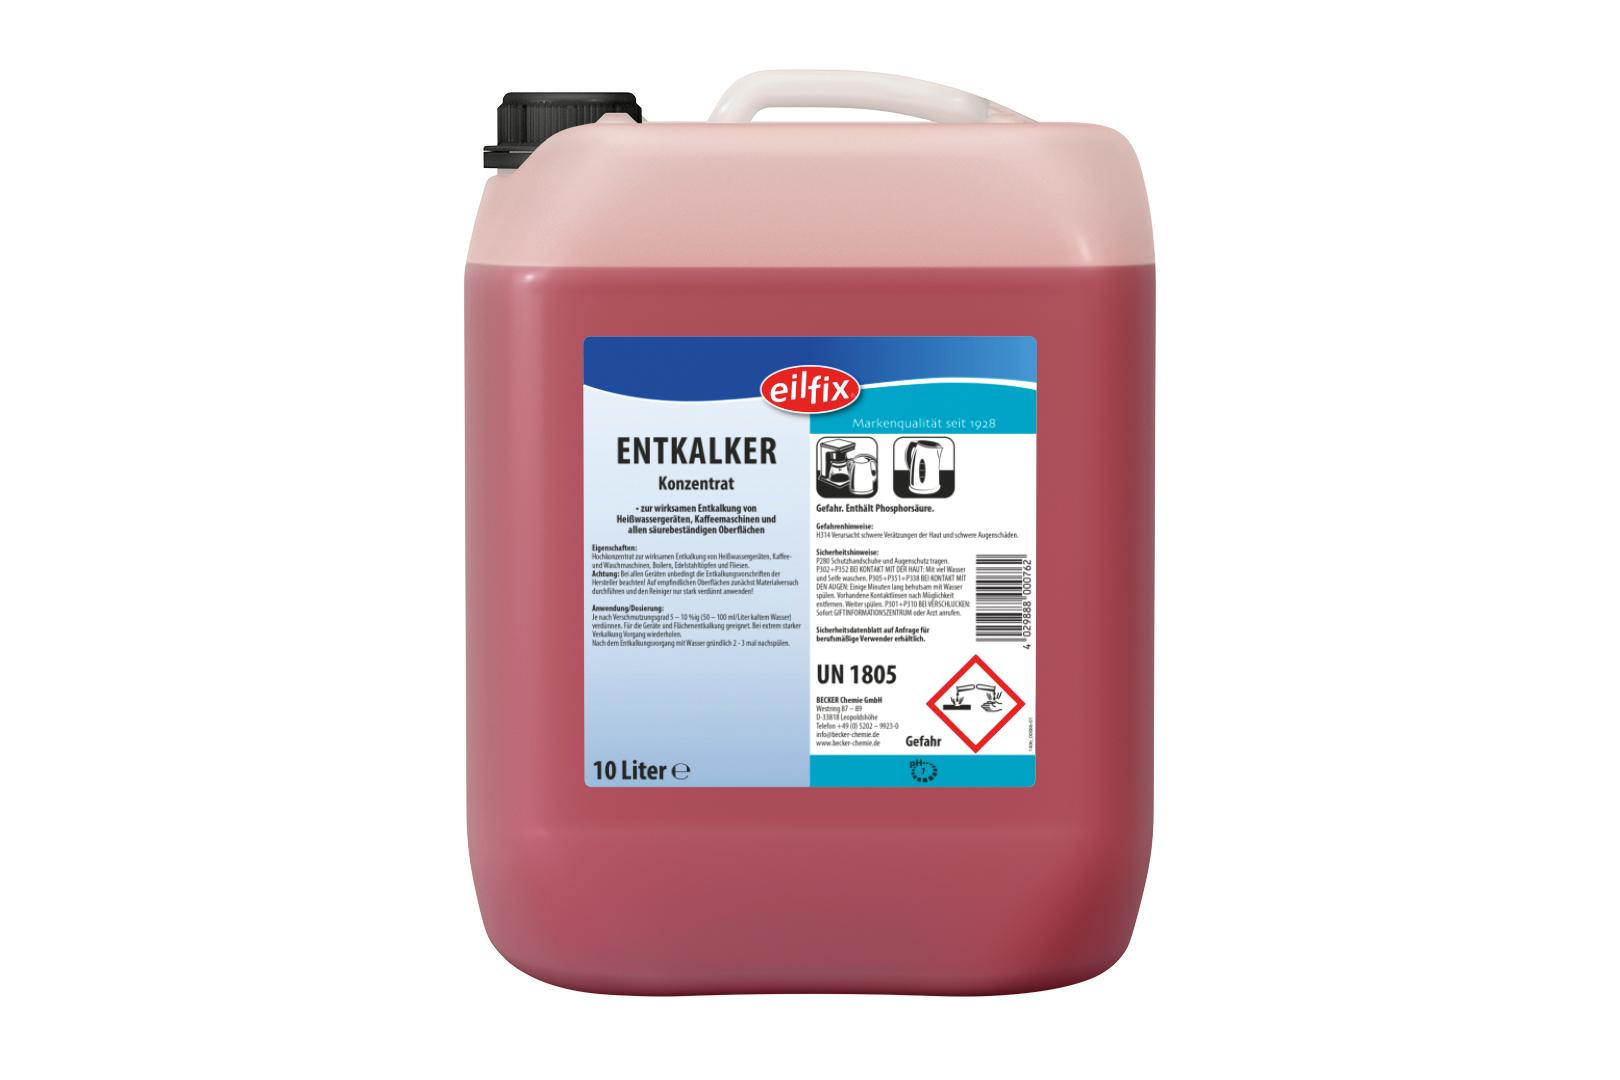 Hygienewelt GmbH Entkalker flüssig